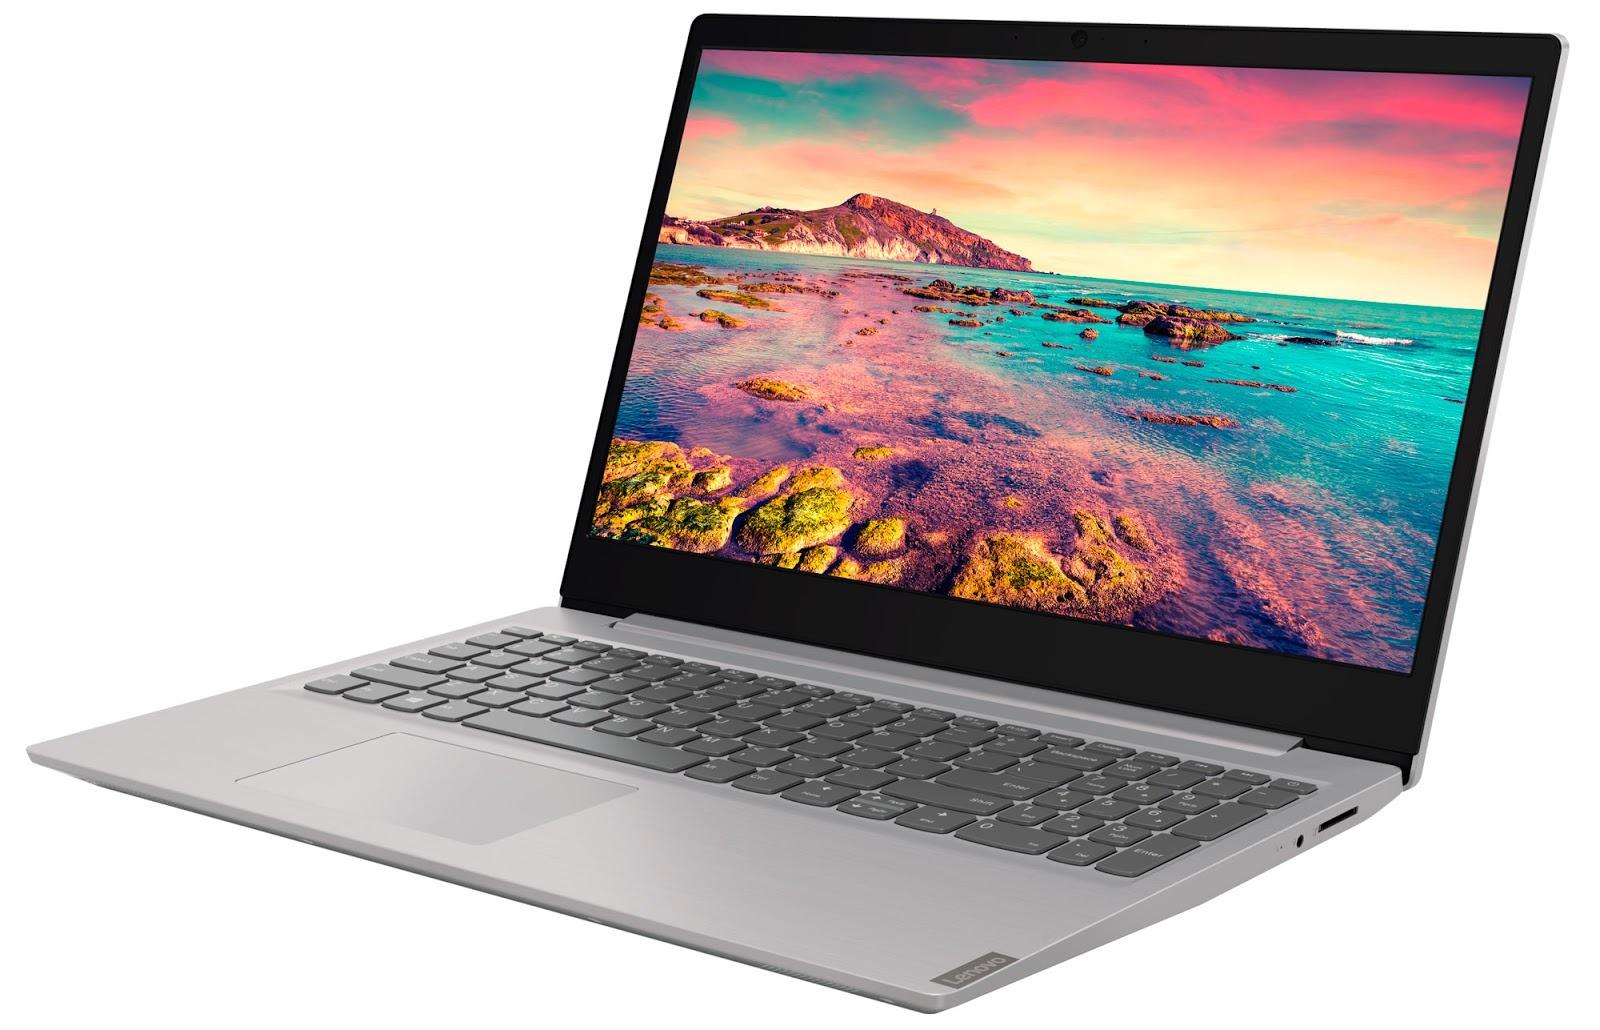 Фото 2. Ноутбук Lenovo ideapad S145-15AST (81N300E9RE)